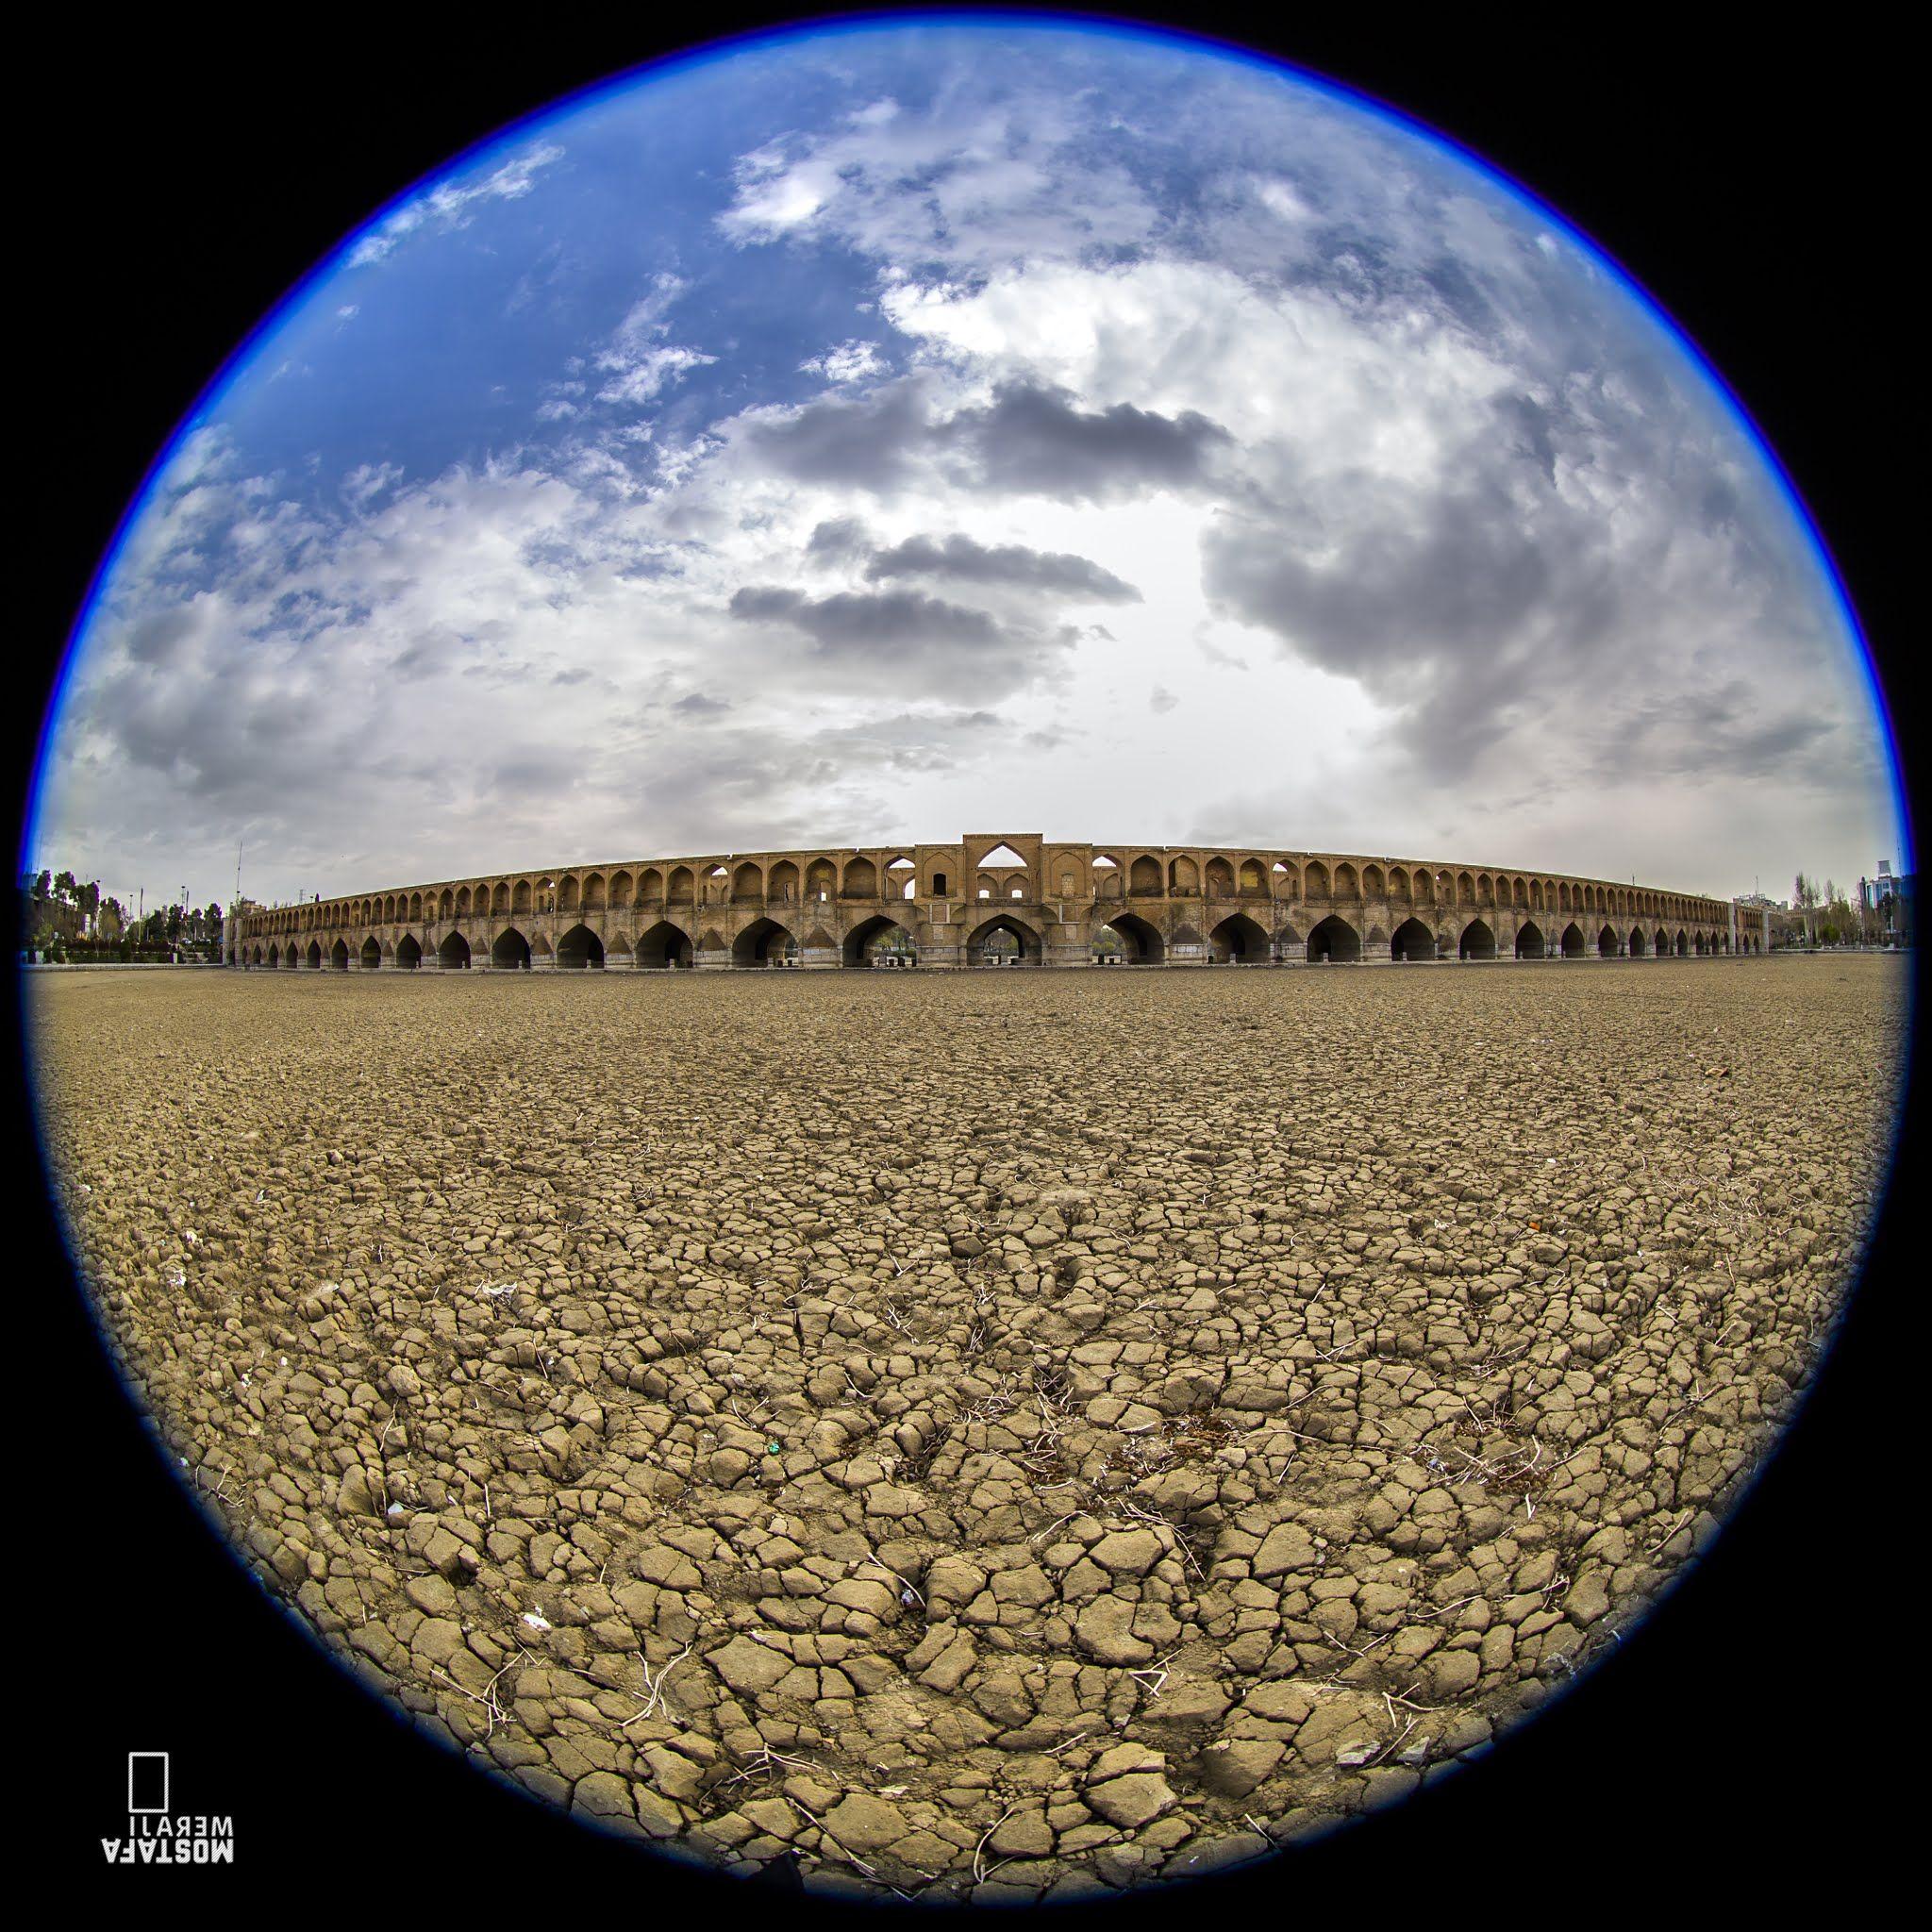 Fisheye Lens Canon Fisheye Lens Iran Mostafa Meraji Monument Monuments Beautiful Iran Architectural Photograp Iran Pictures Instagram Photo Pictures